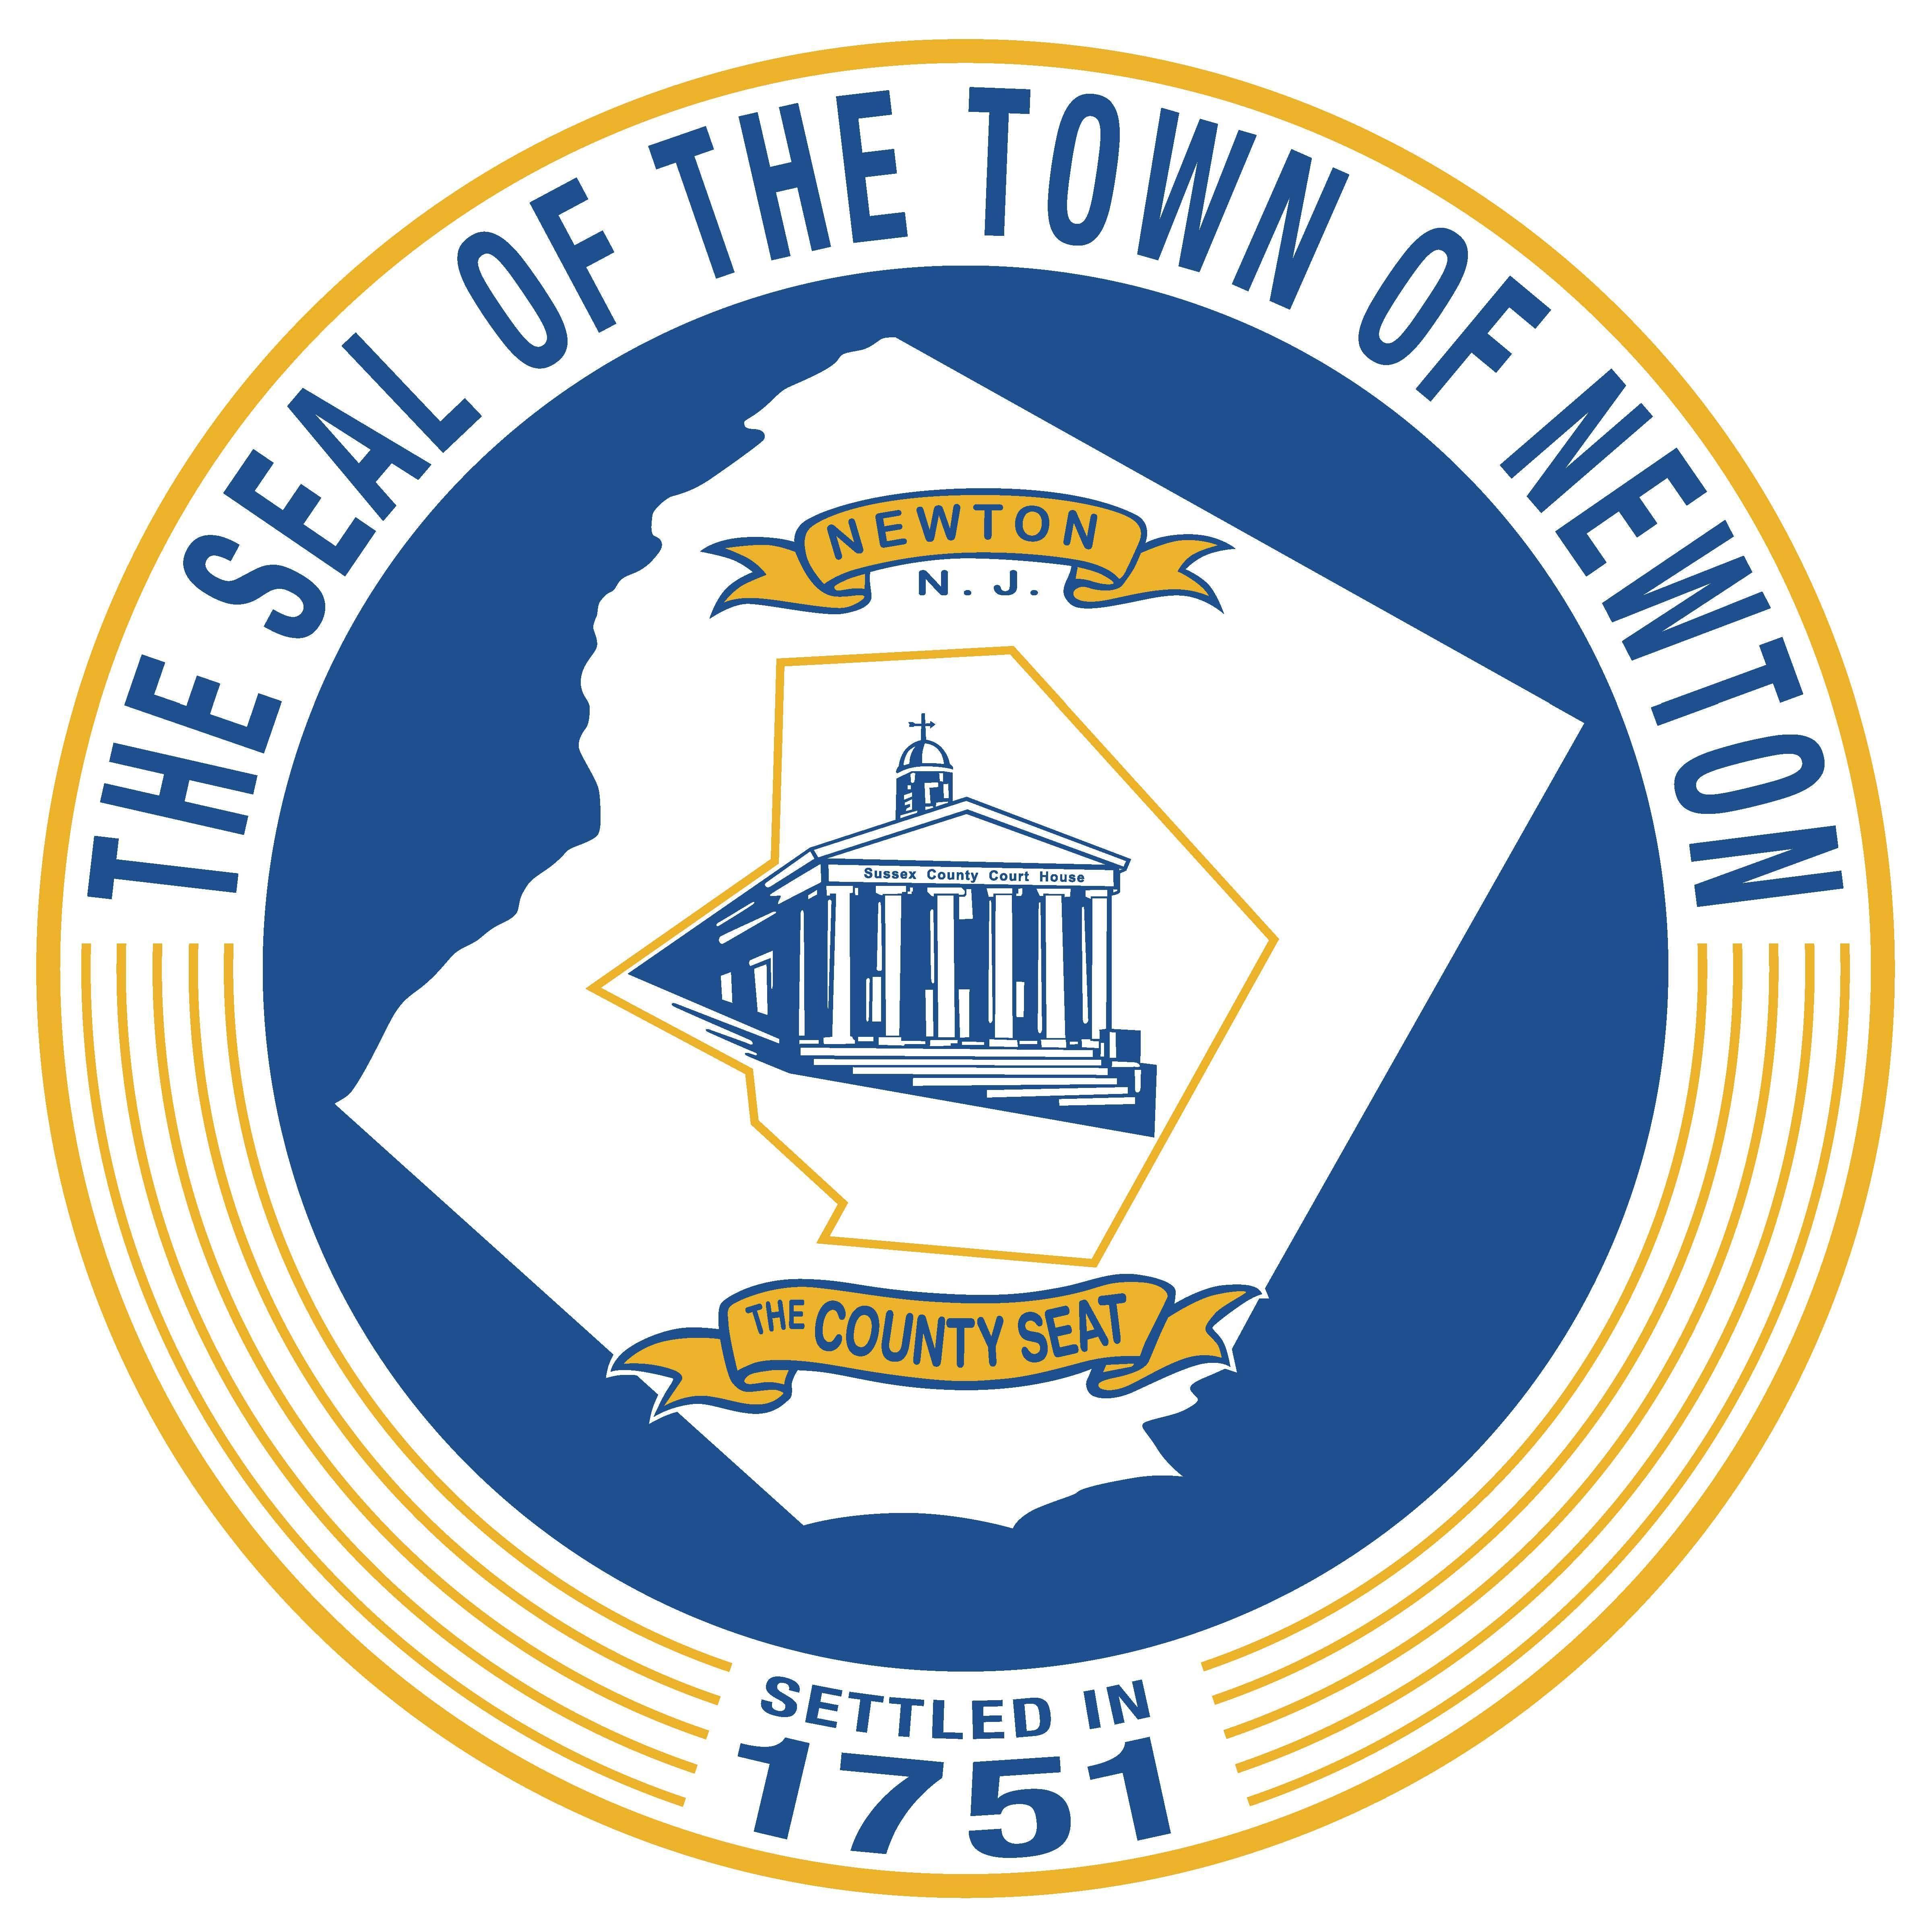 a409b42b6212ecd3498c_Town_Seal_05_blue_v1.jpg